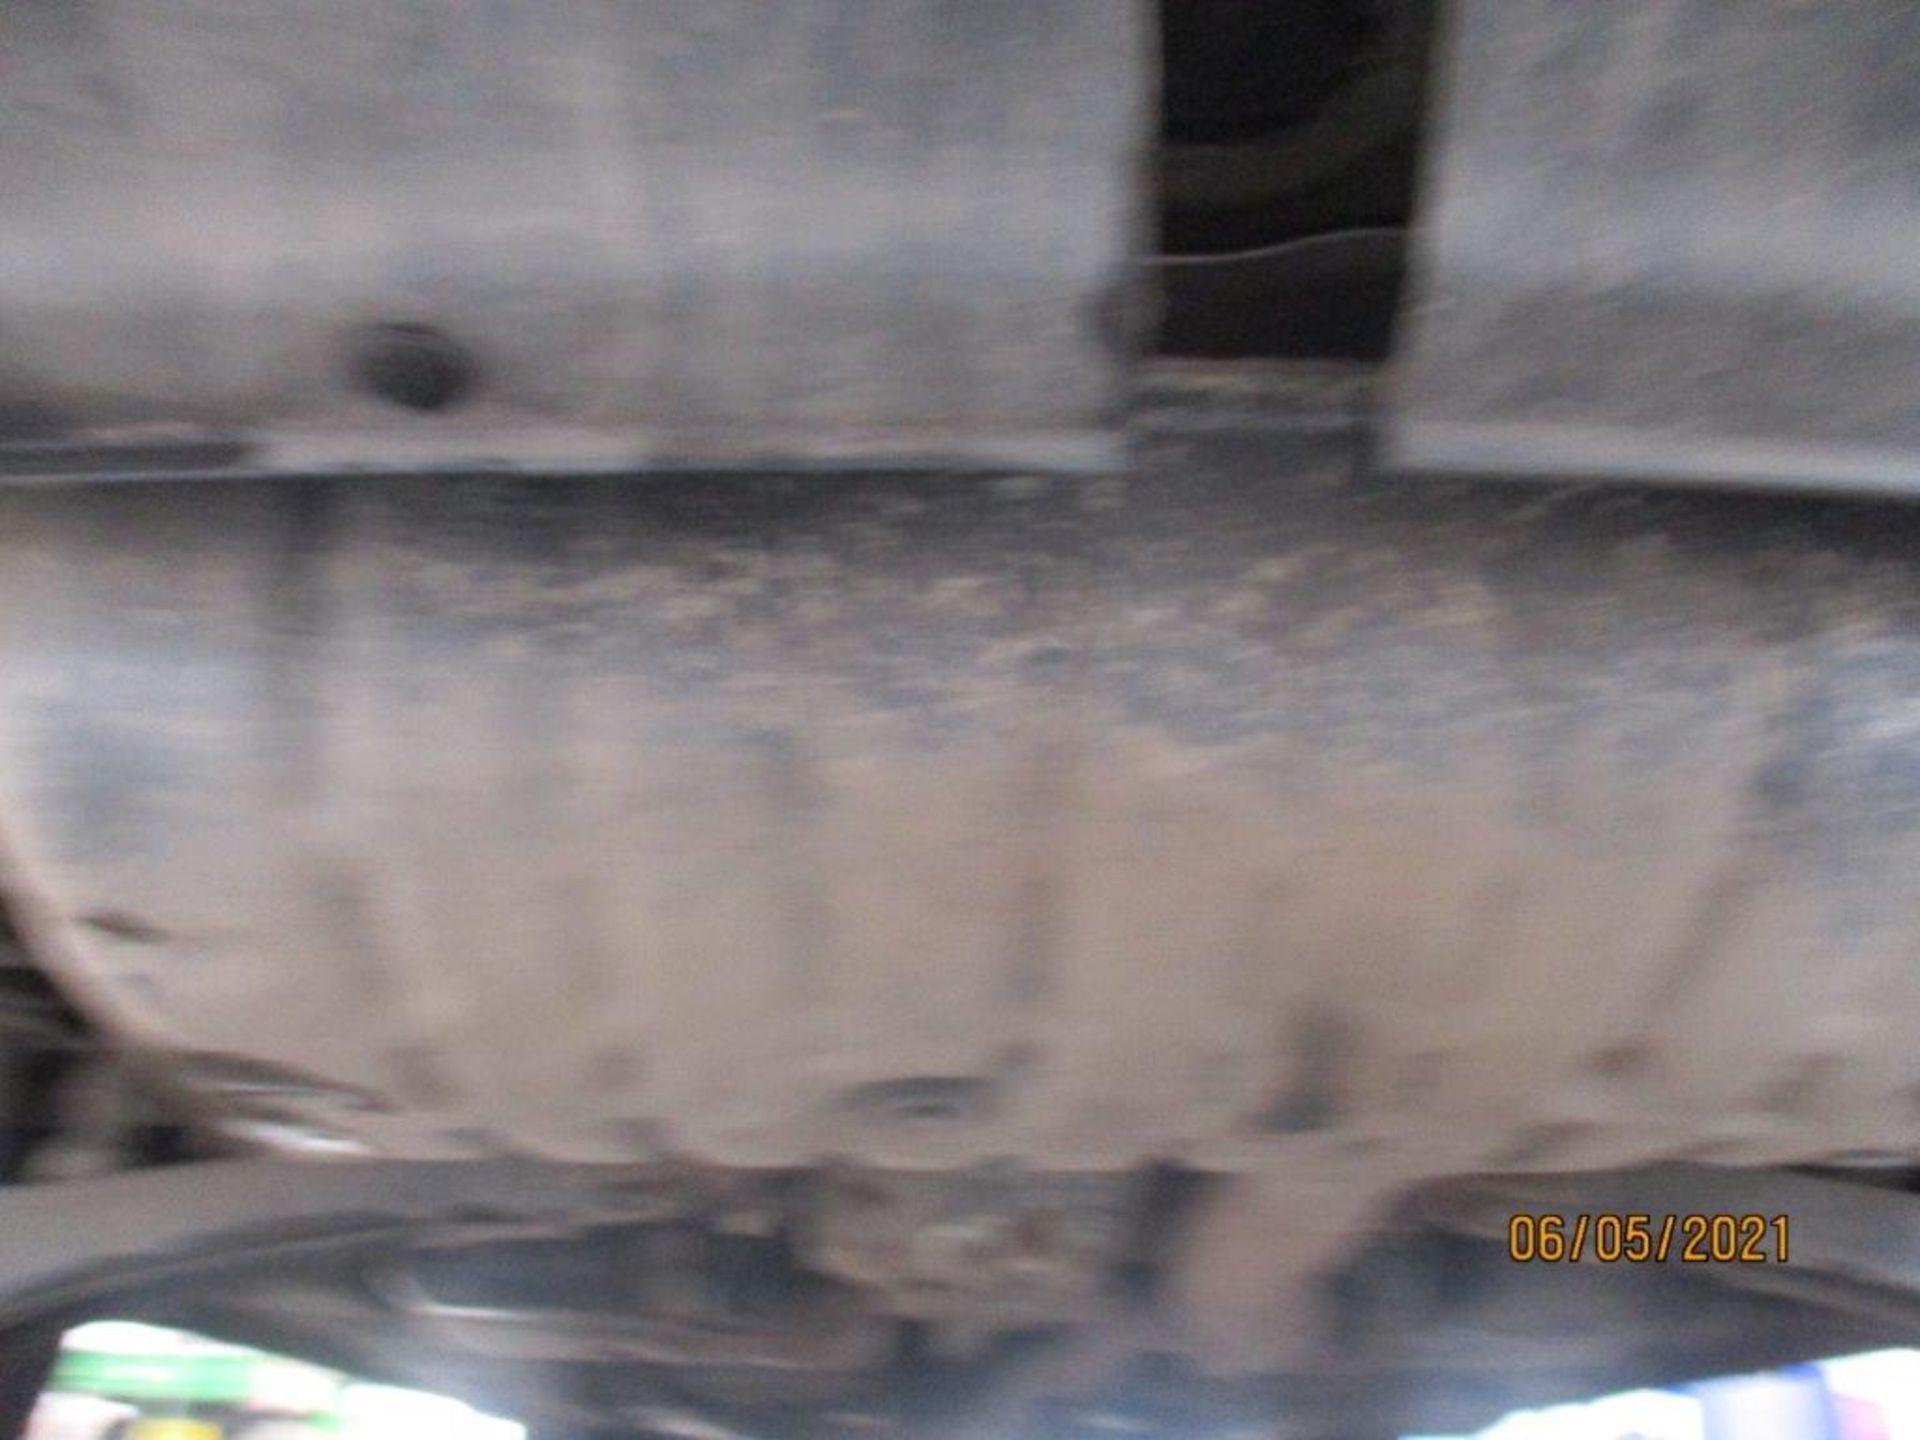 11 11 Jeep Patriot LTD CRD - Image 10 of 16